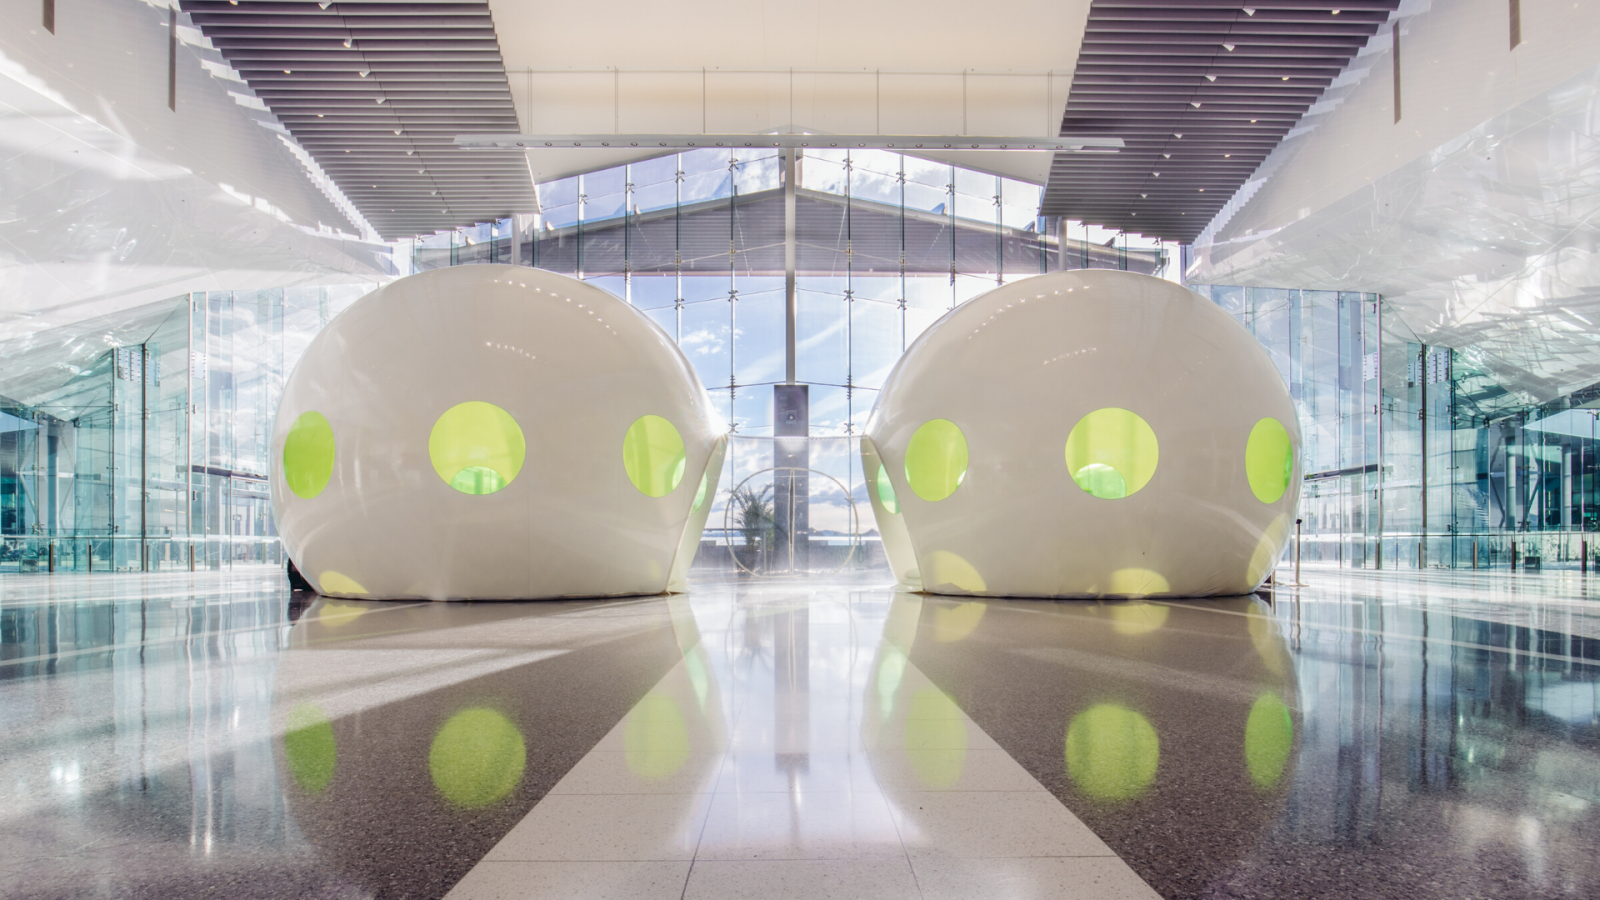 TWIN MINIGAGARIN, Plastique Fantastique, Canberra Airport. Photo: 5 Foot Photography